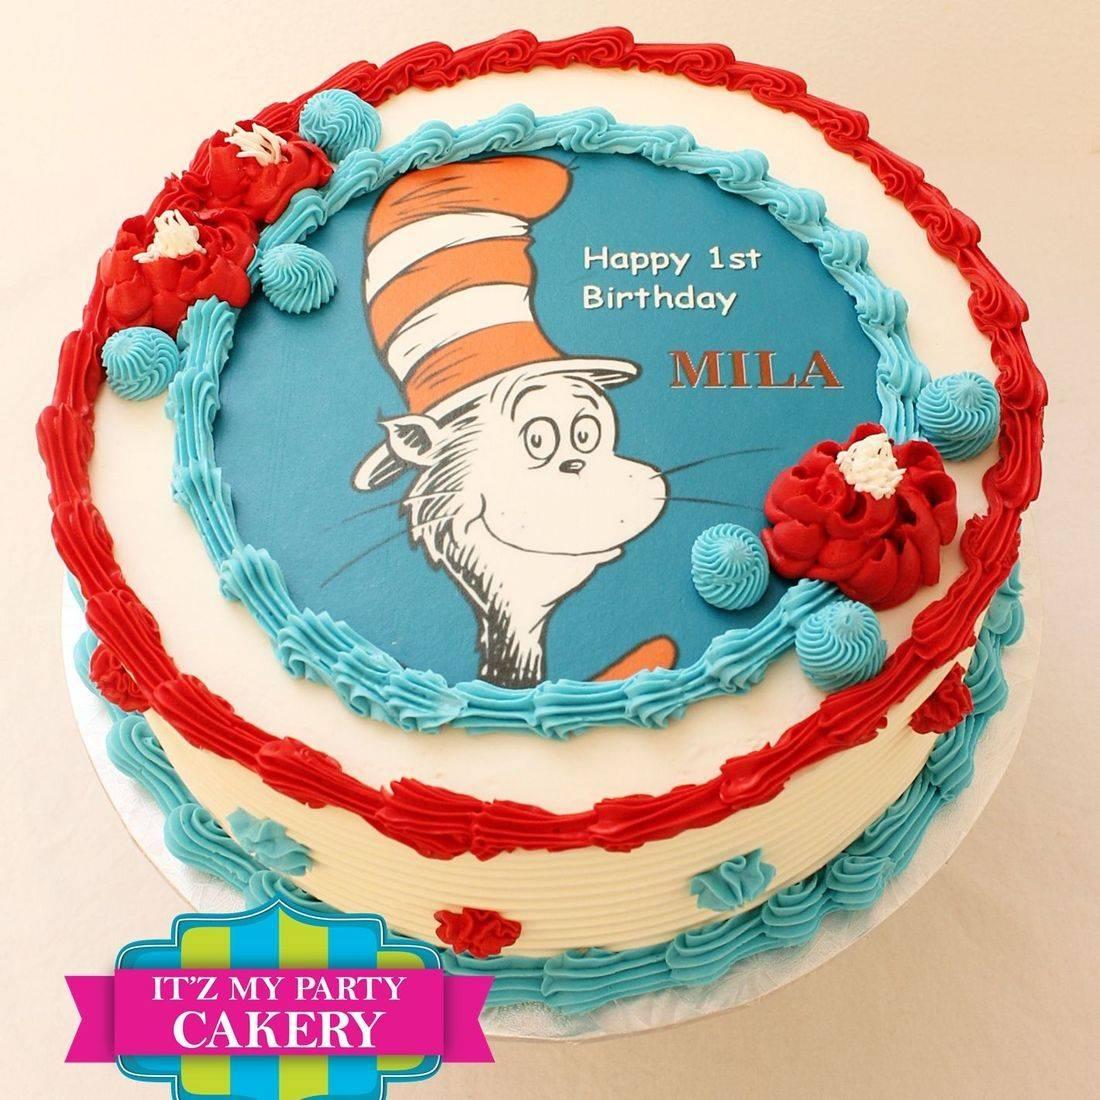 Buttercream Cake, Photo Cake, Edible Image Cake